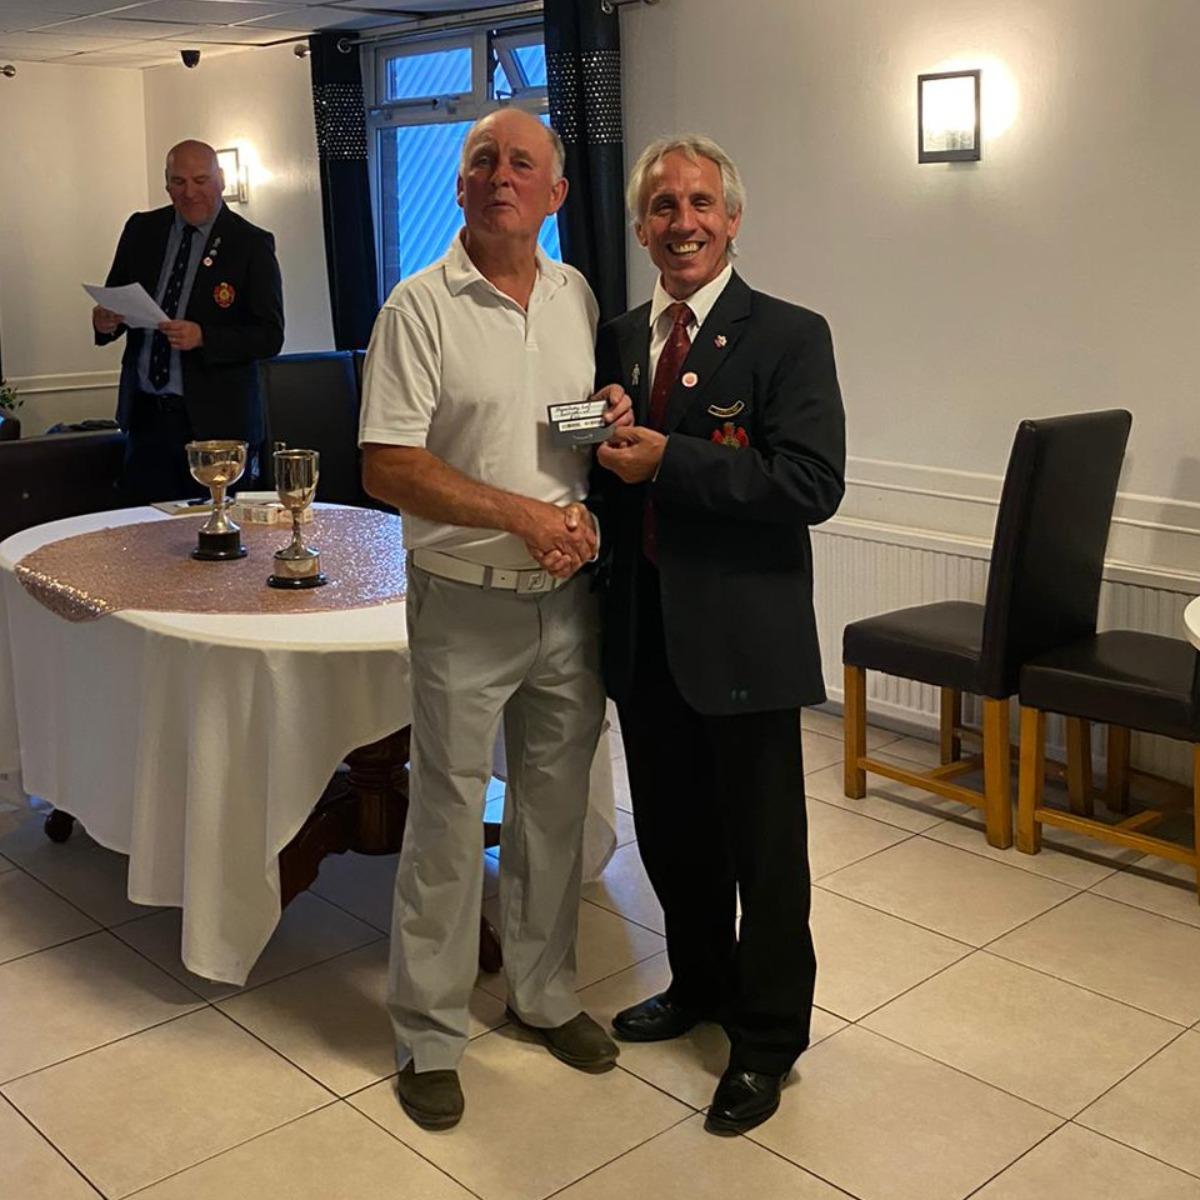 John Broughton - Runner-up Mowsbury Cup